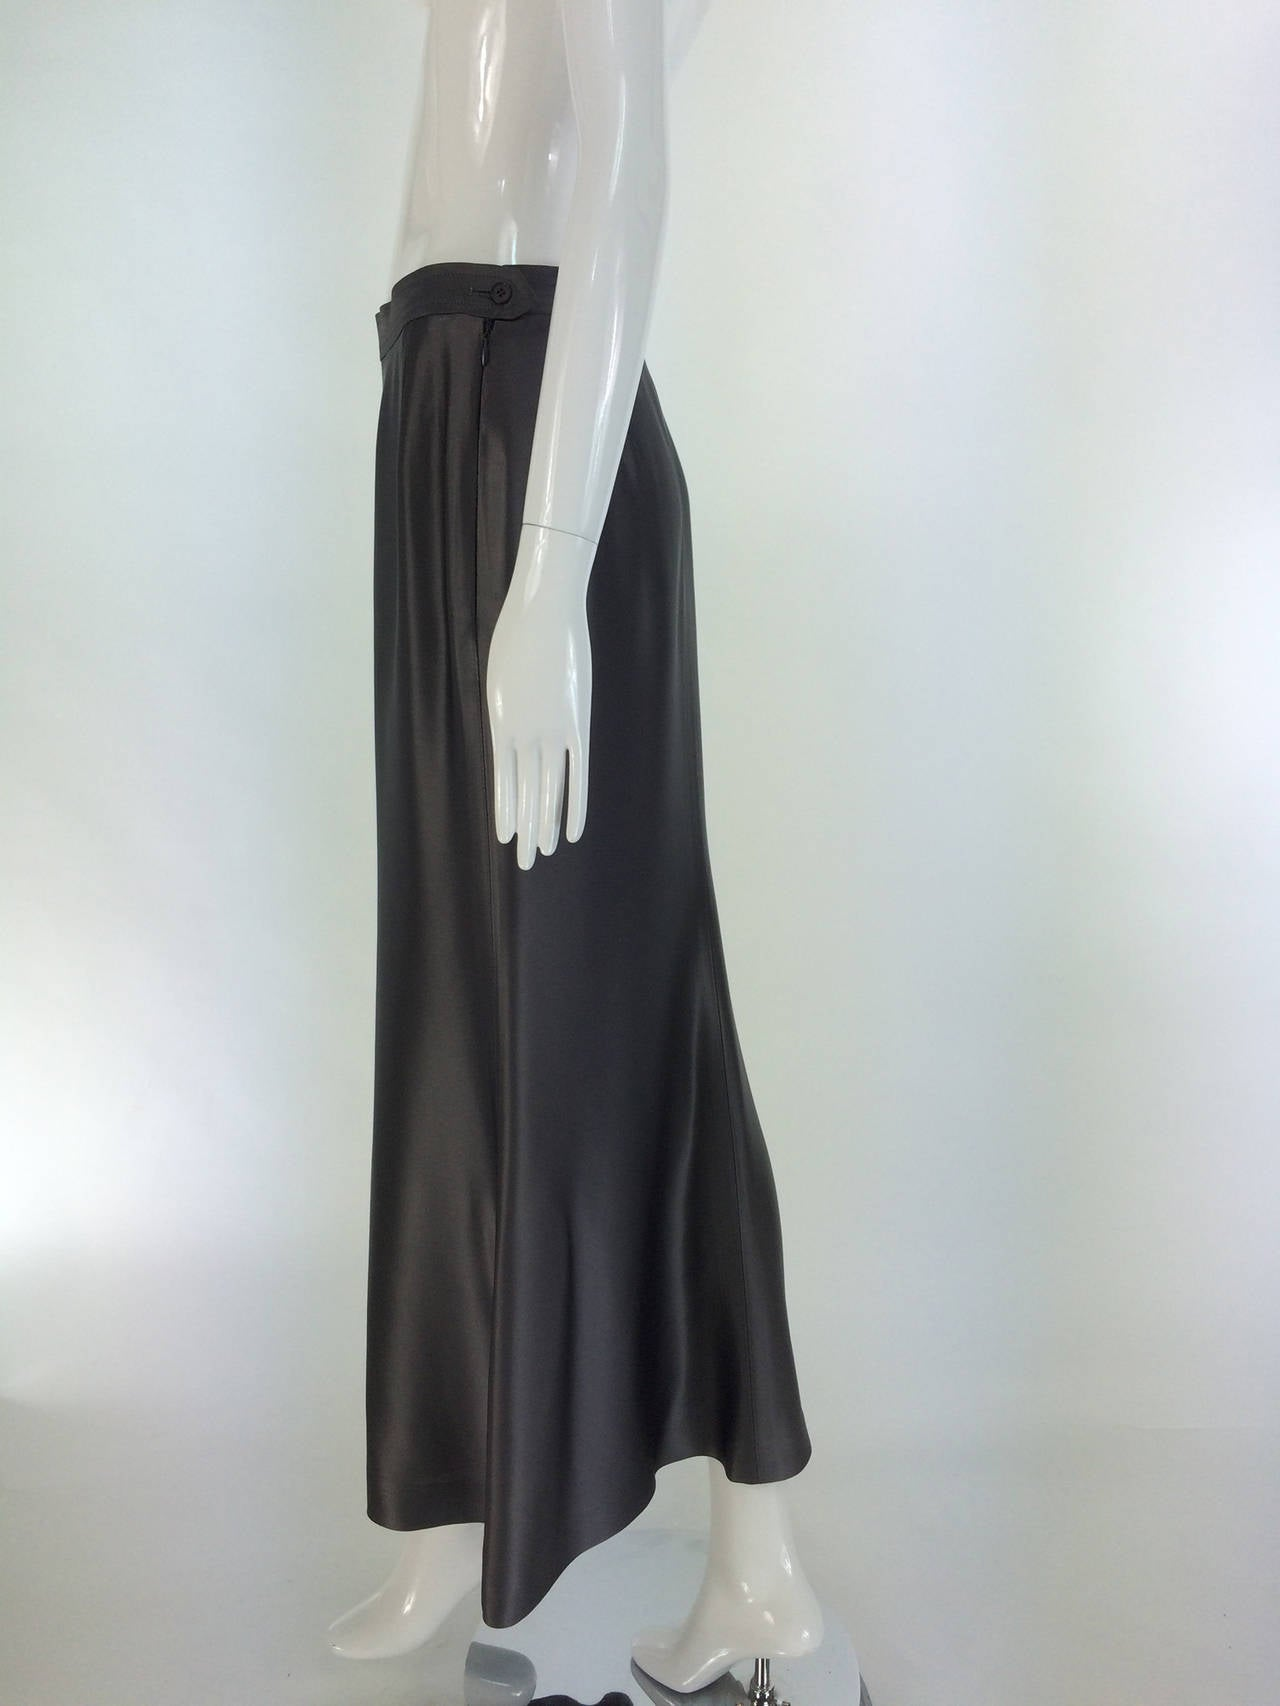 Yves St Laurent Rive Gauche silver grey satin evening skirt 1990s 7